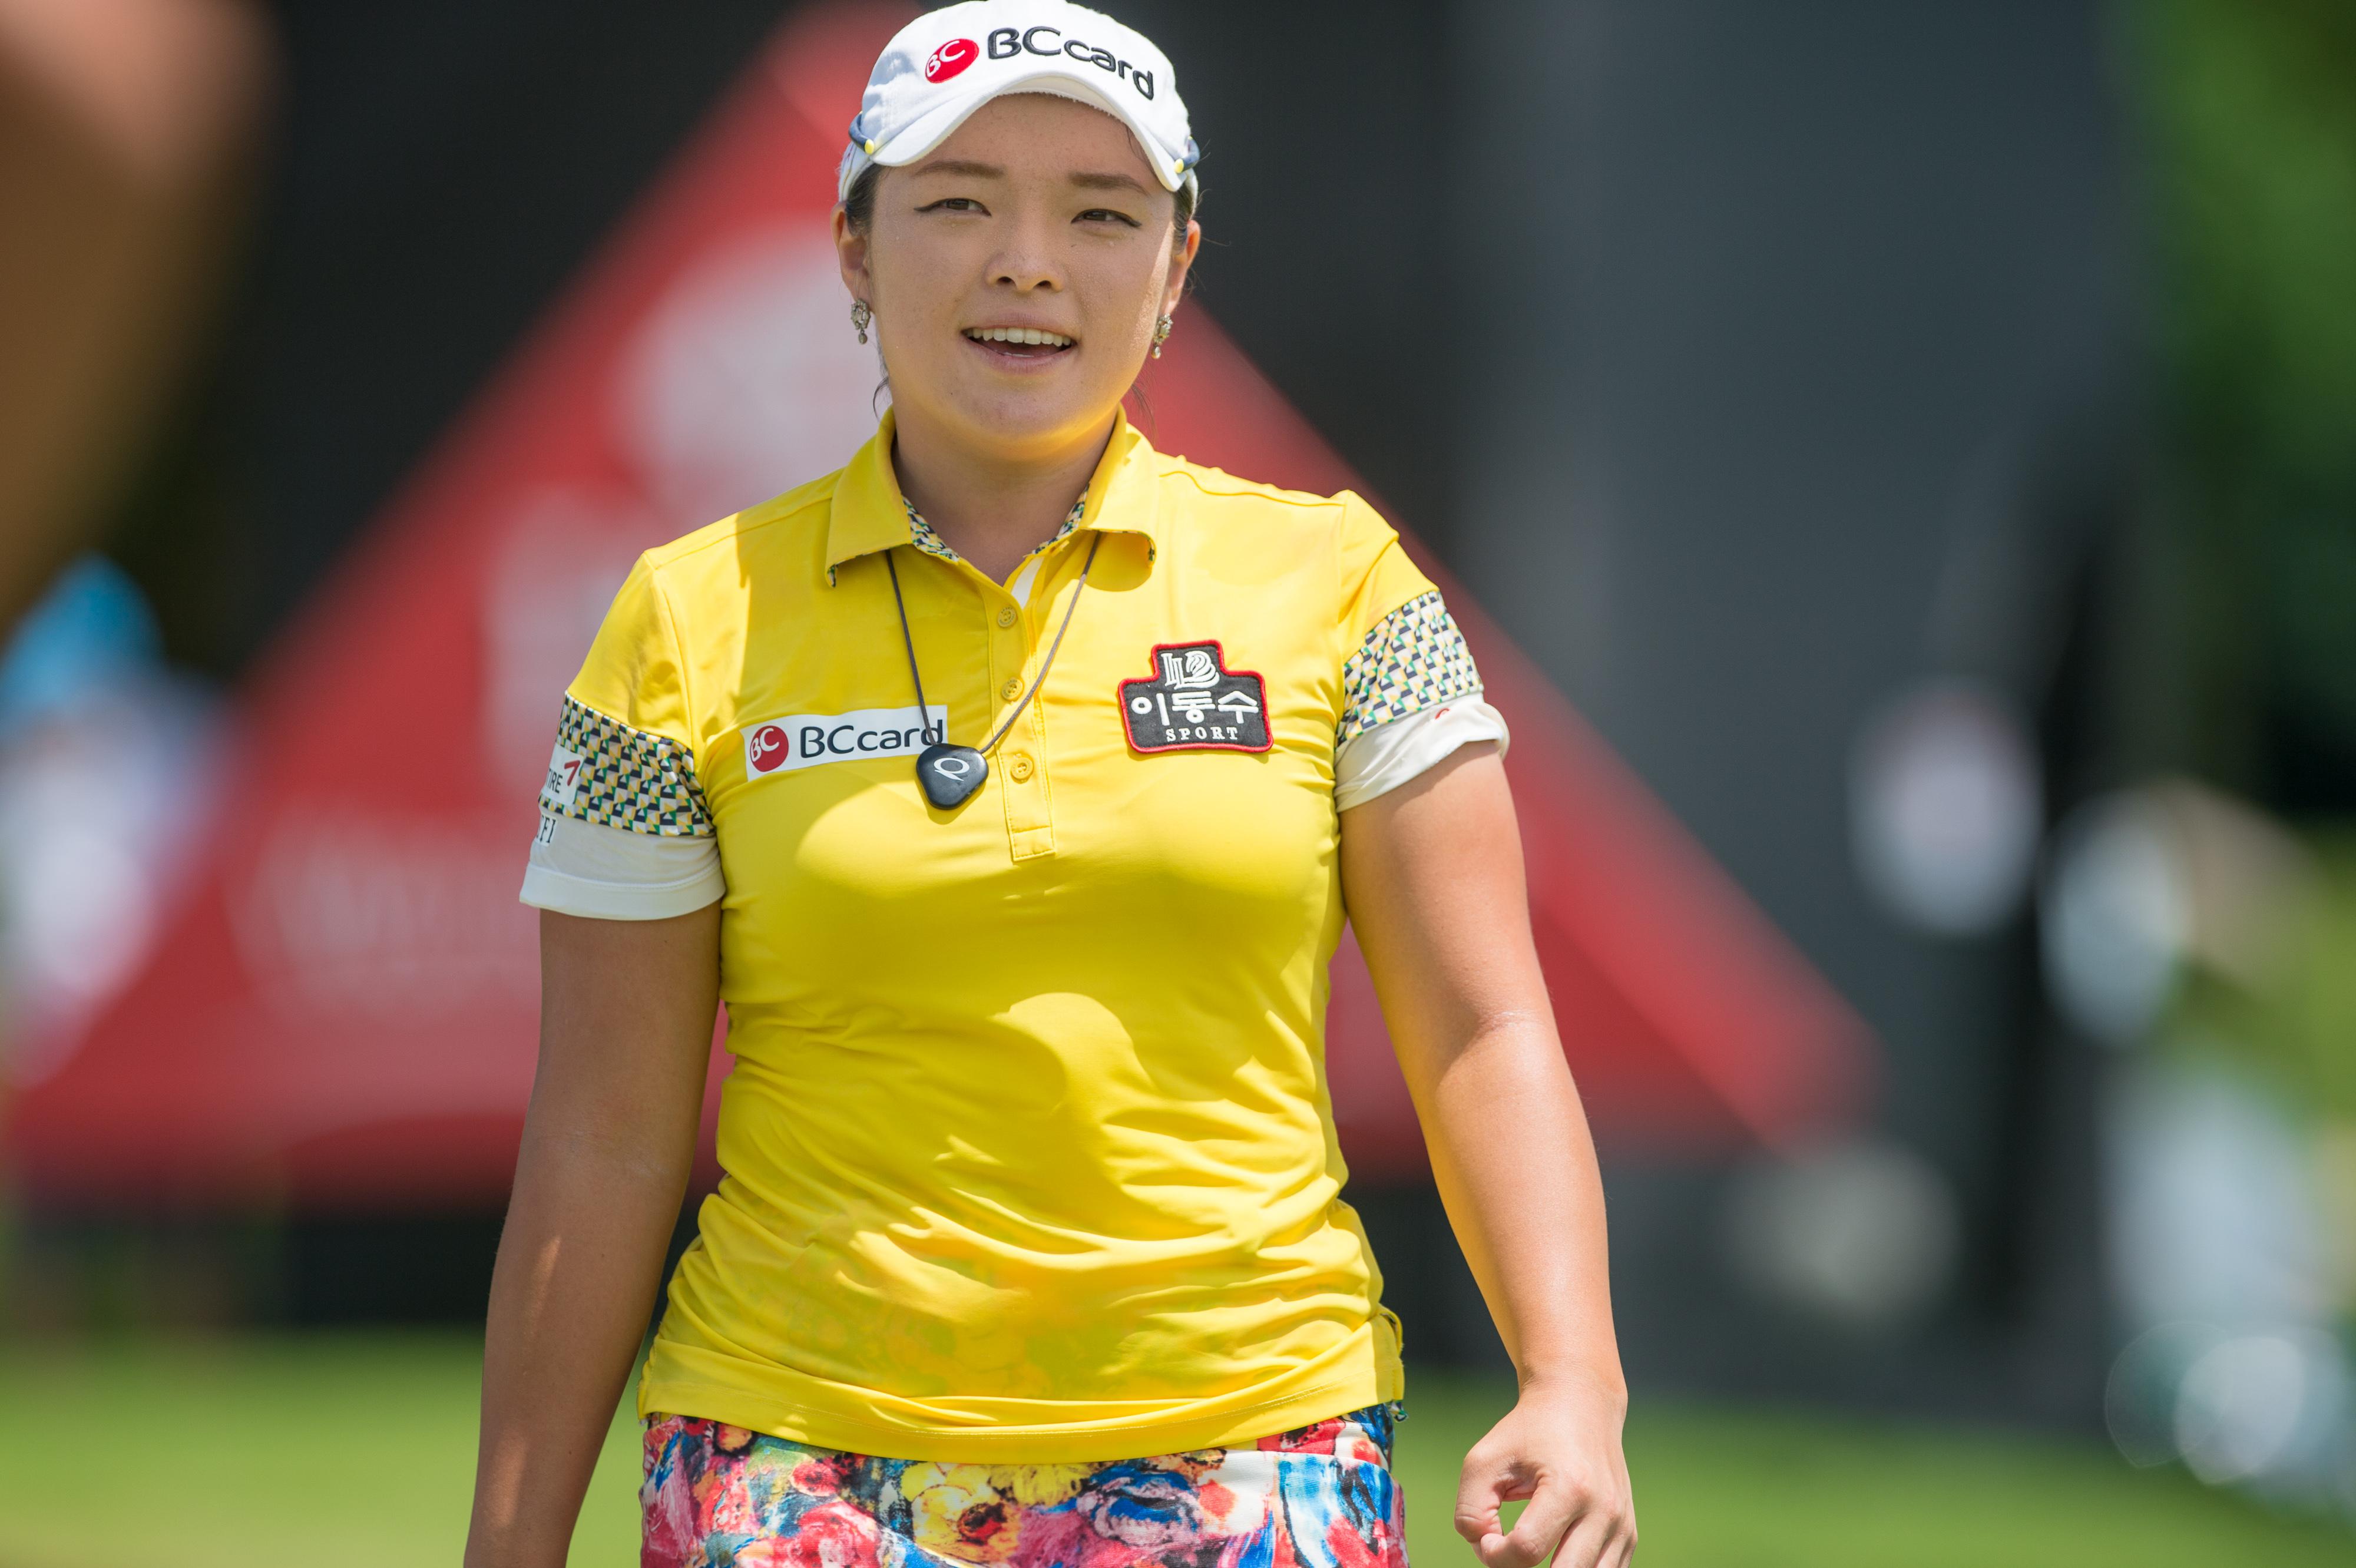 Ha Na Jang (KOR) Tee #16,HSBC women's championship 2016 Champion, March 06, 2016 - Golf : HSBC women's championship 2016 at Sentosa Golf Club, in Sentosa, Singapore. (Photo by Haruhiko Otsuka/ Nippon News, AFLO) (via AP)